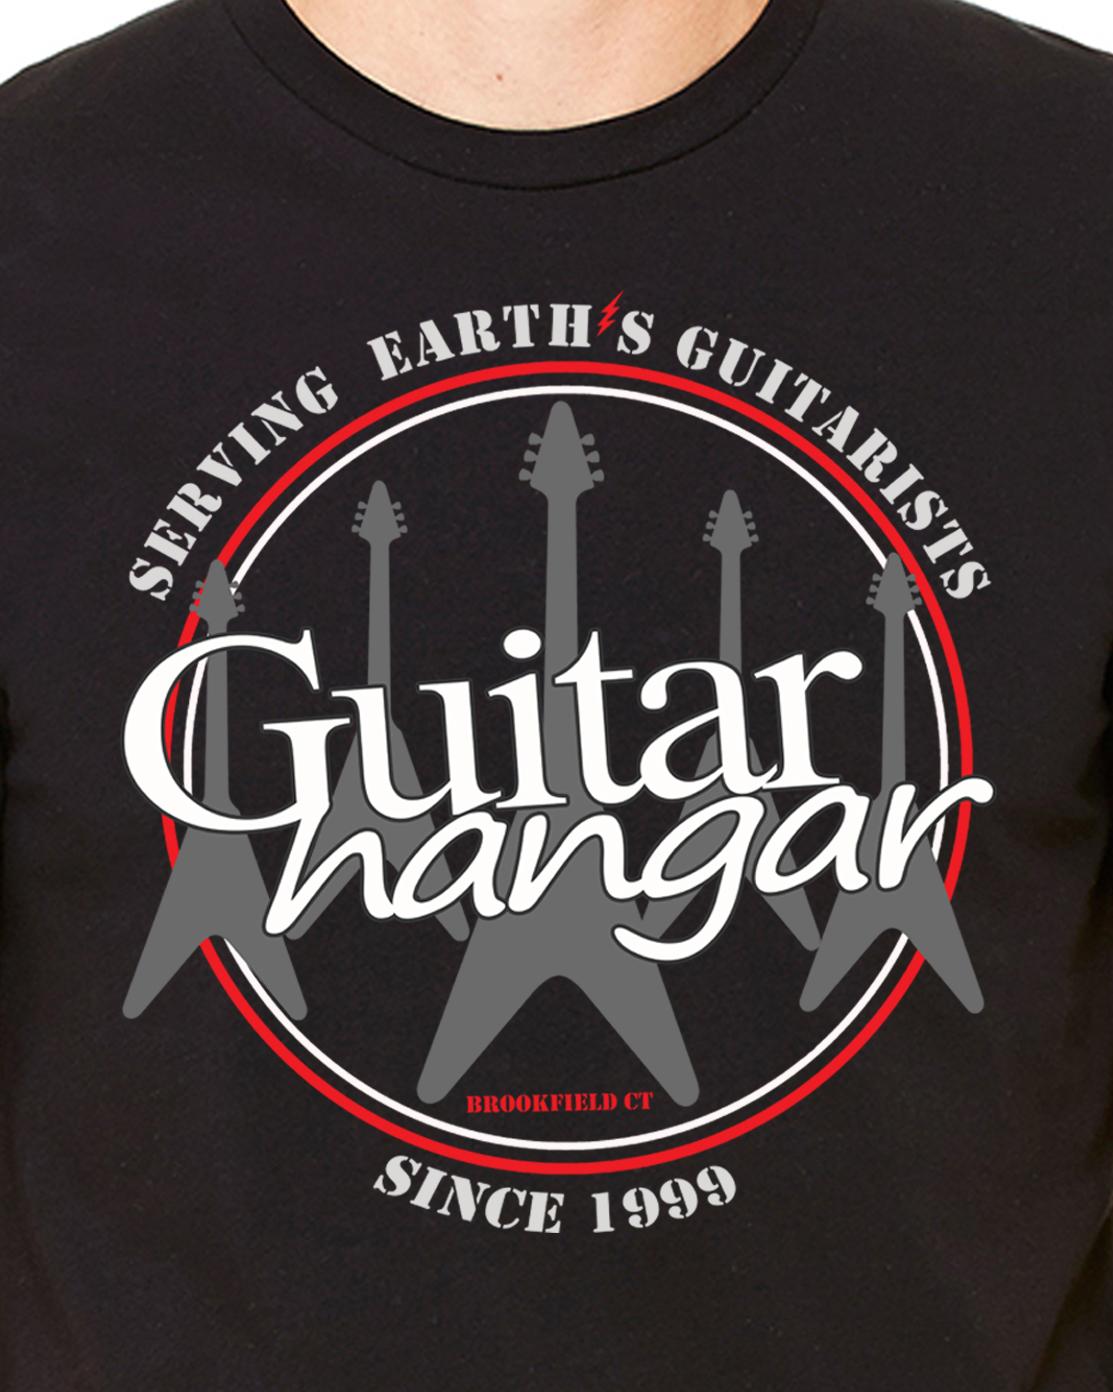 Rickenbacker Guitar Logo T-Shirt S M L XL 2XL 3XL